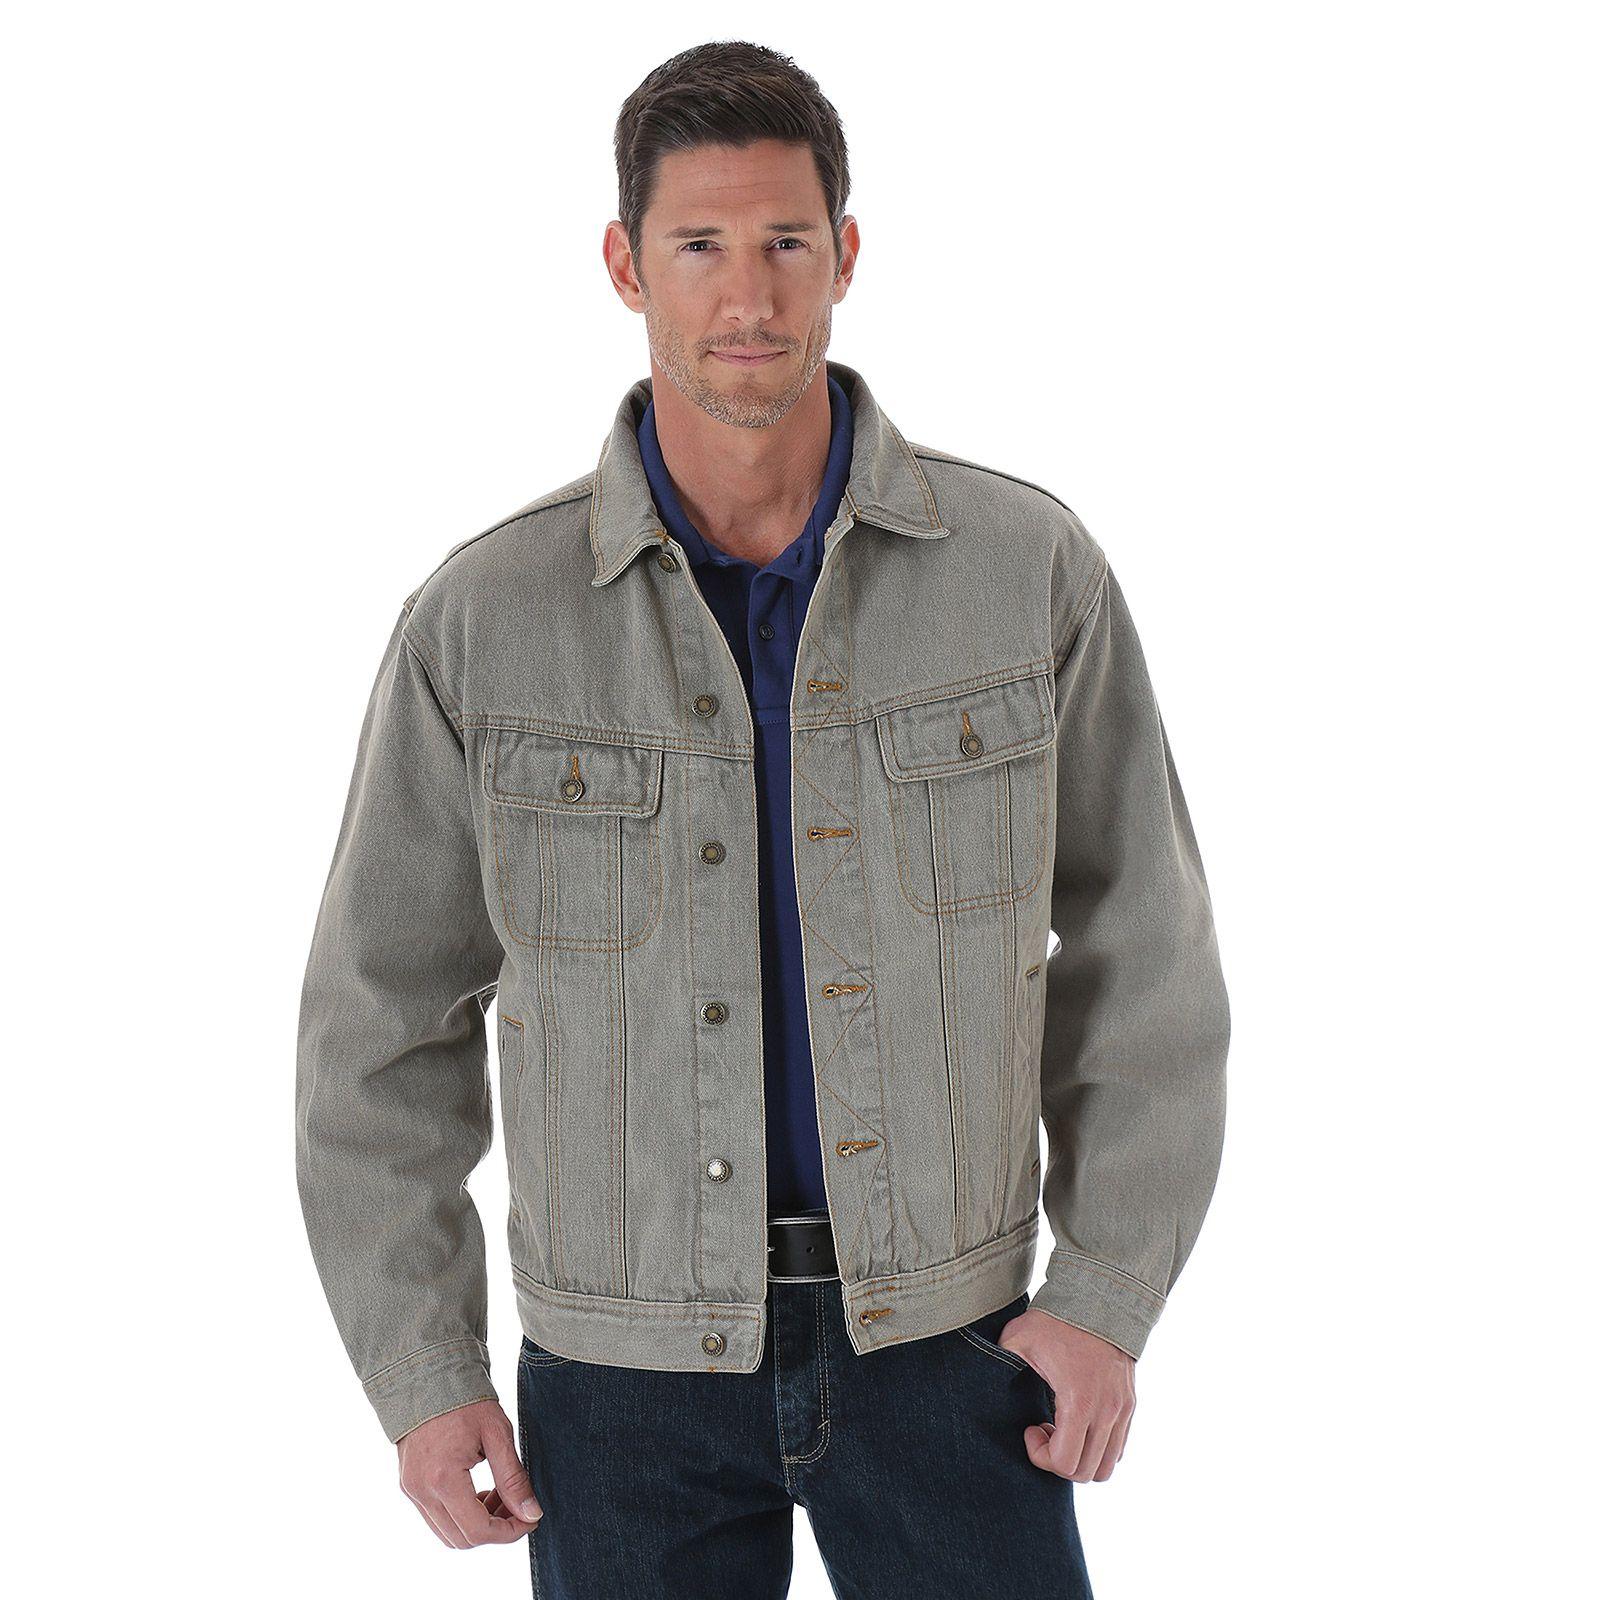 Wrangler Moss Denim Jacket Denim Jacket Men Denim Jacket Hipster Mens Fashion [ 1600 x 1600 Pixel ]